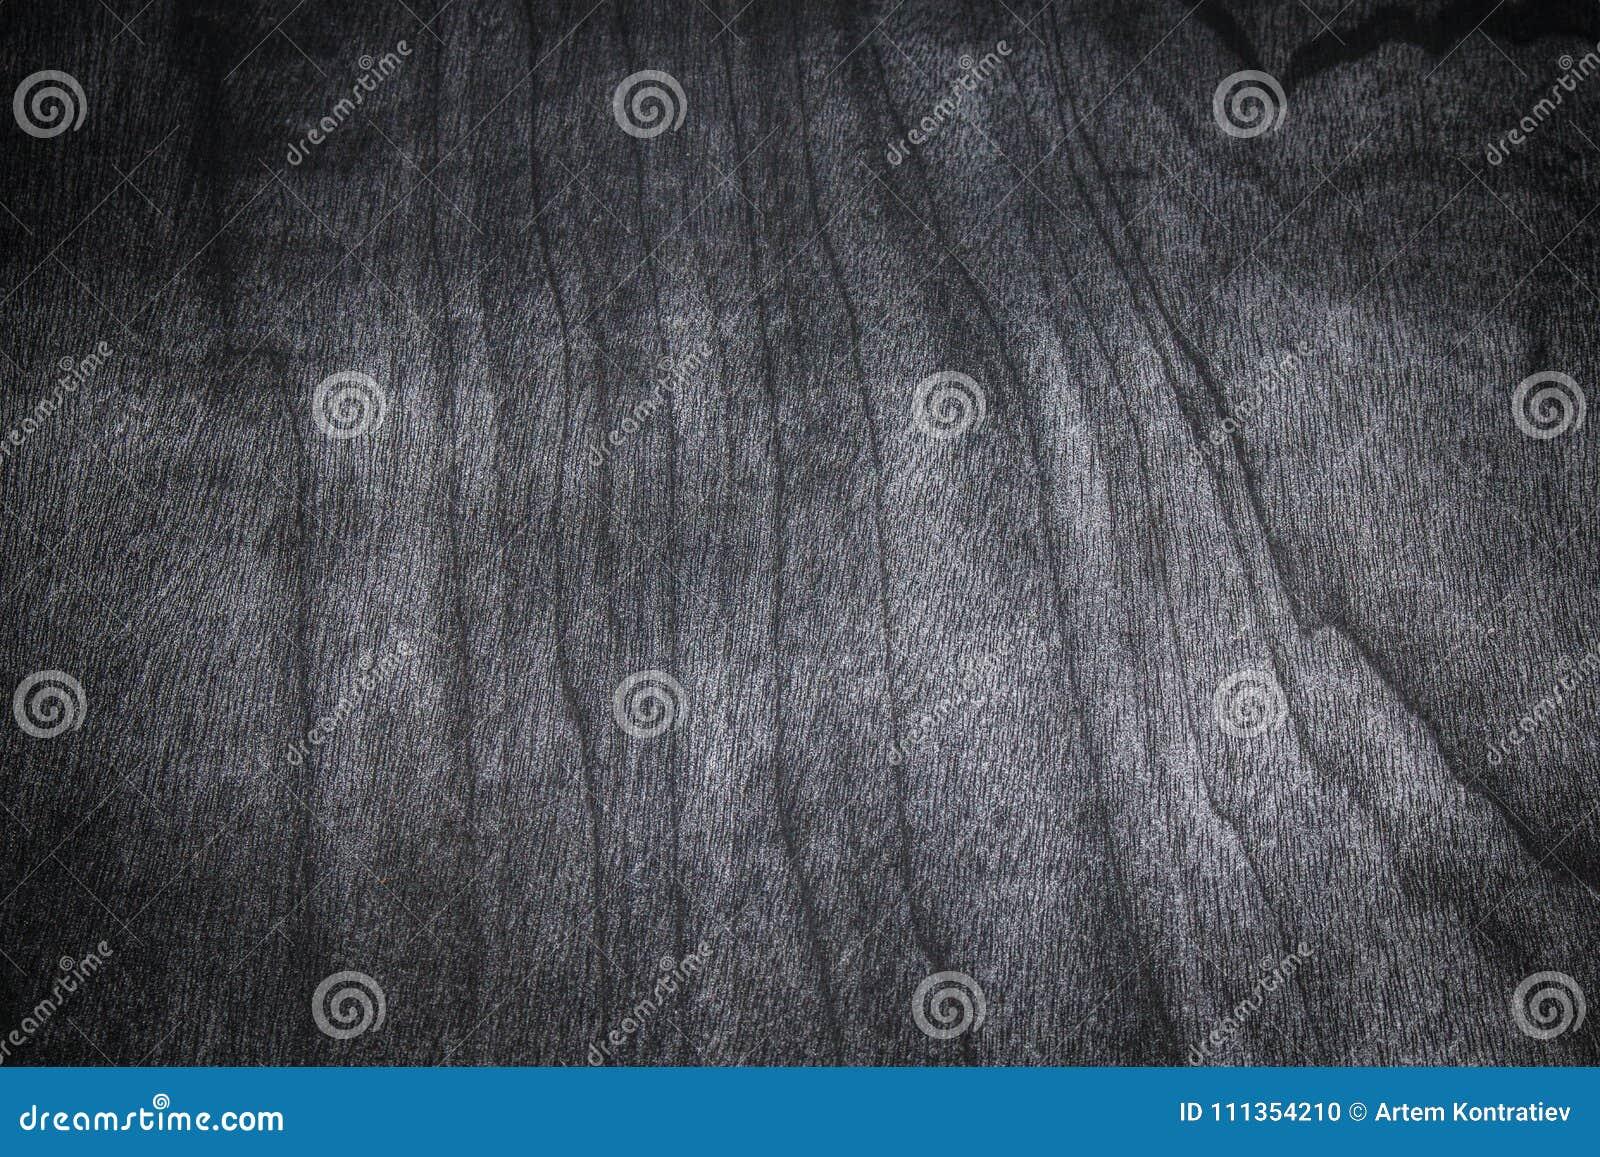 Dark Wood Texture background. Texture of black table desk.